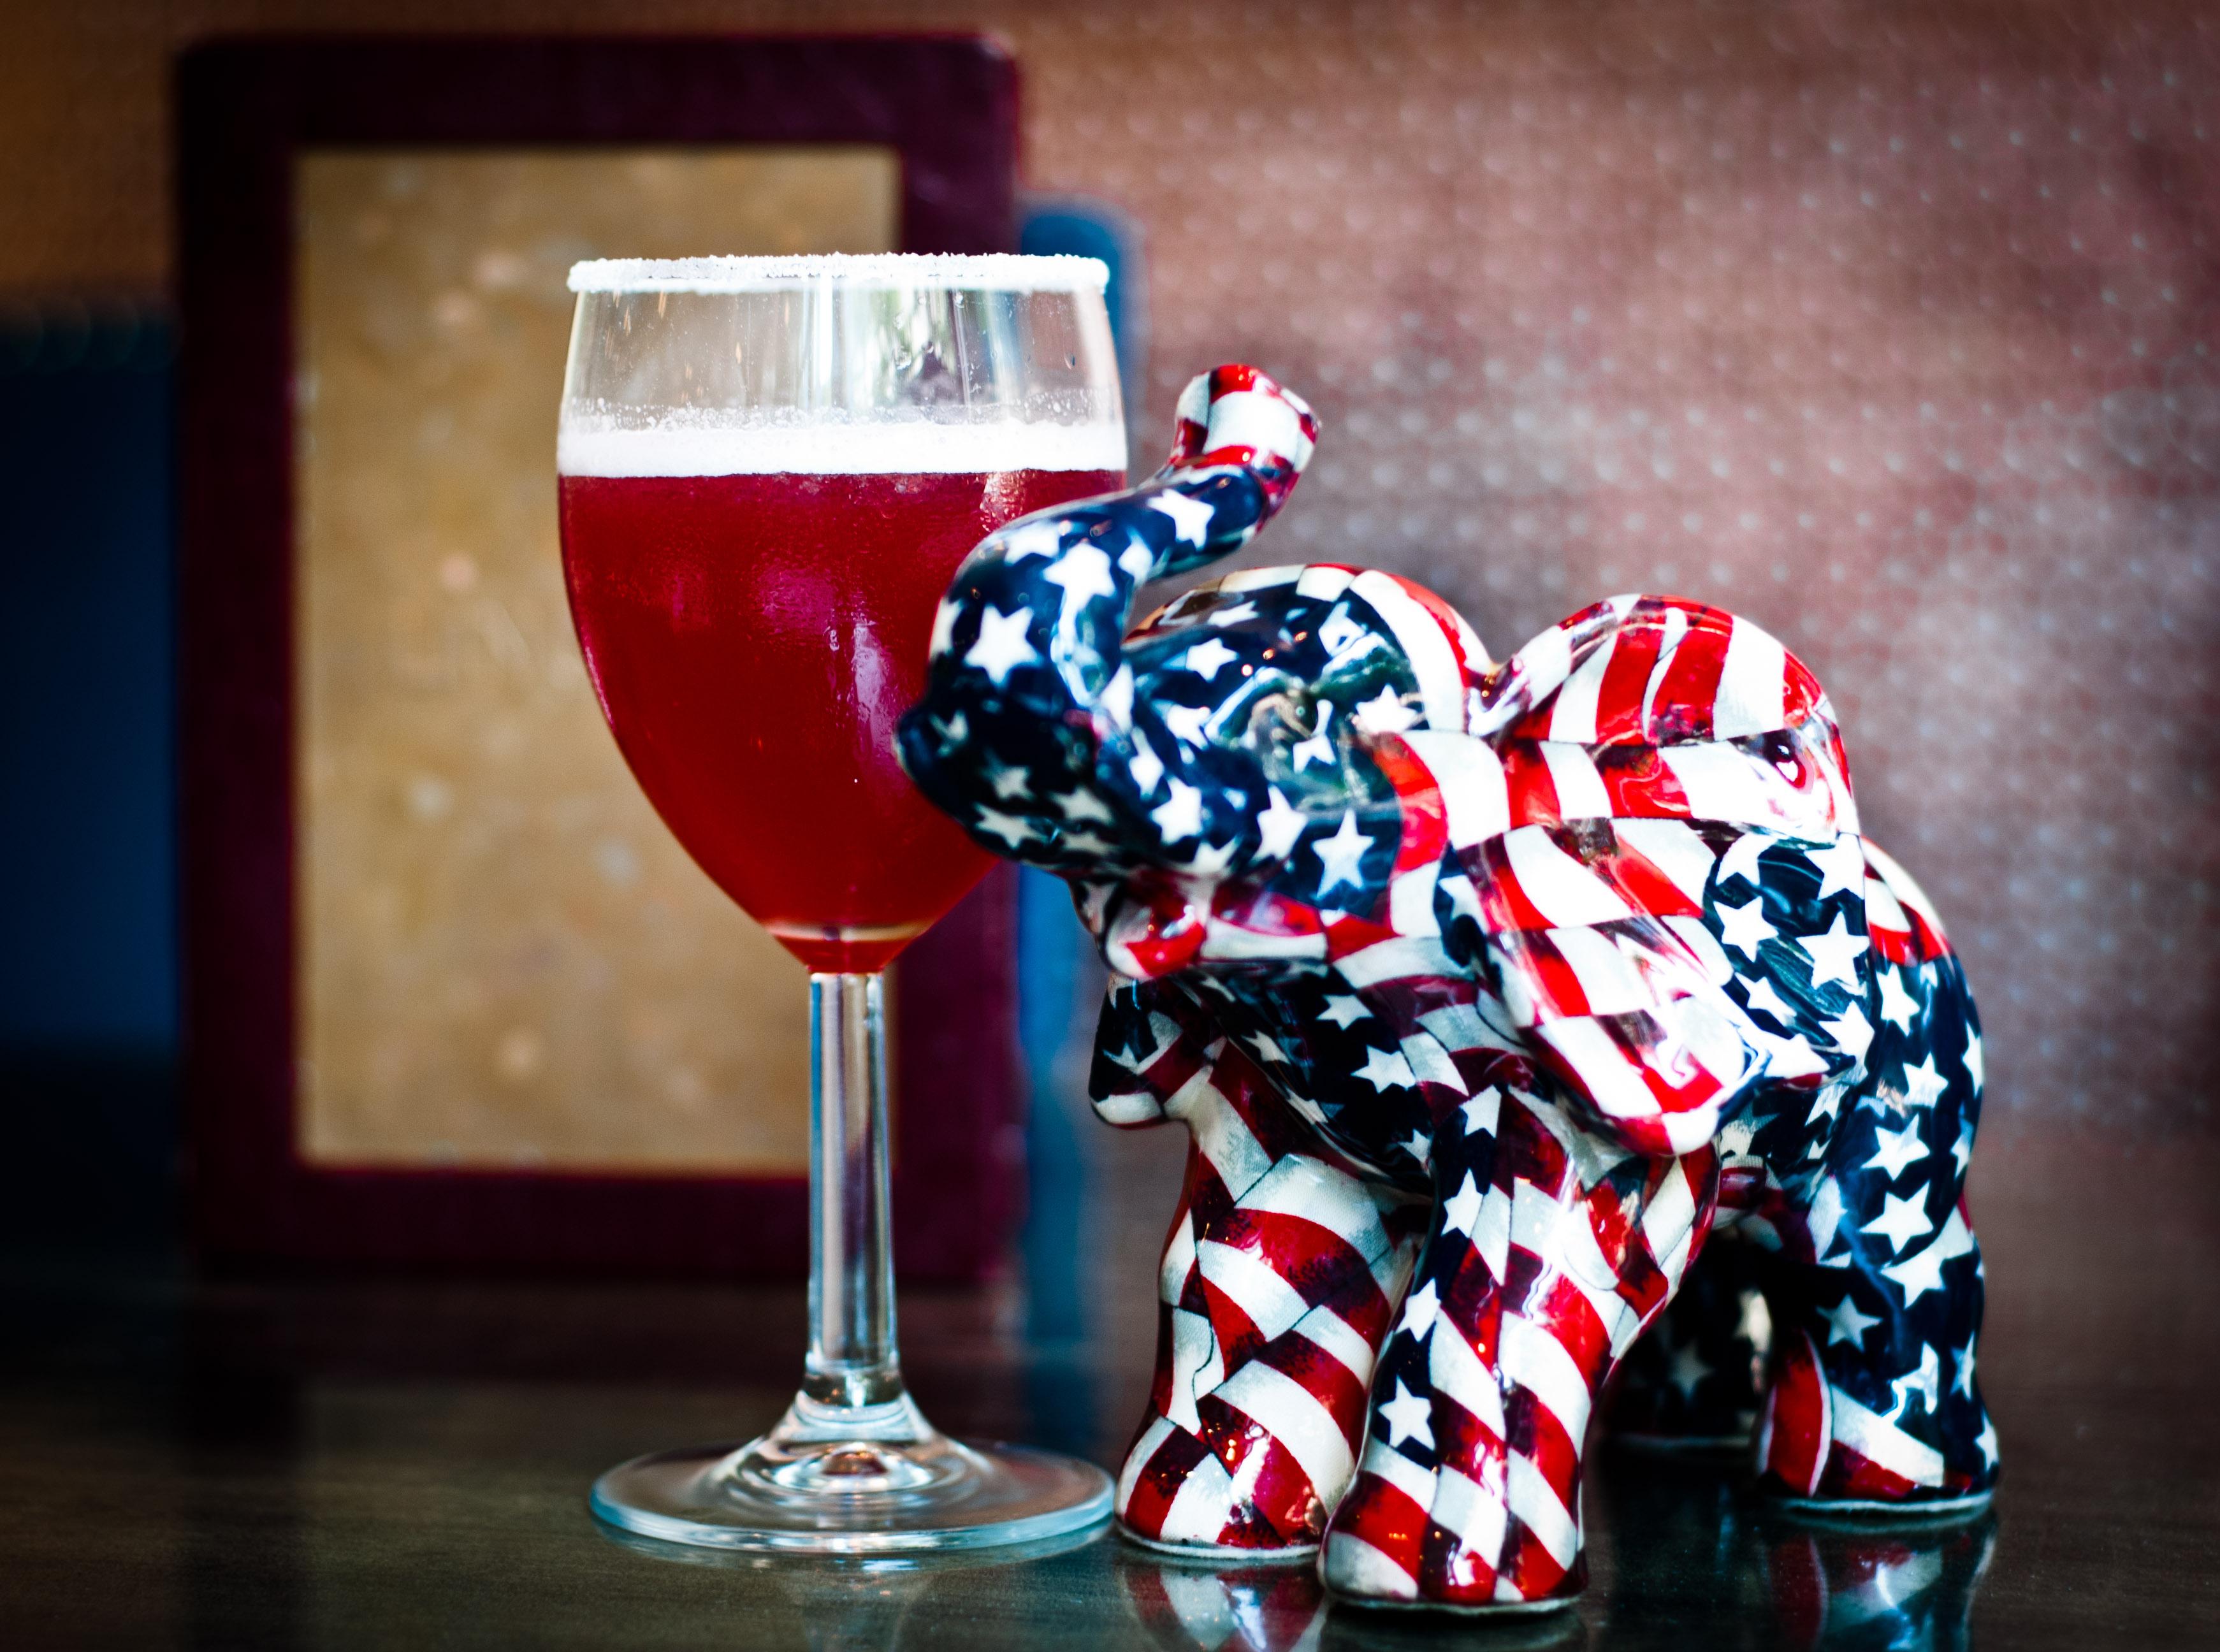 The Elephant: Rhubarb infused whiskey, home made strawberry liquor ...